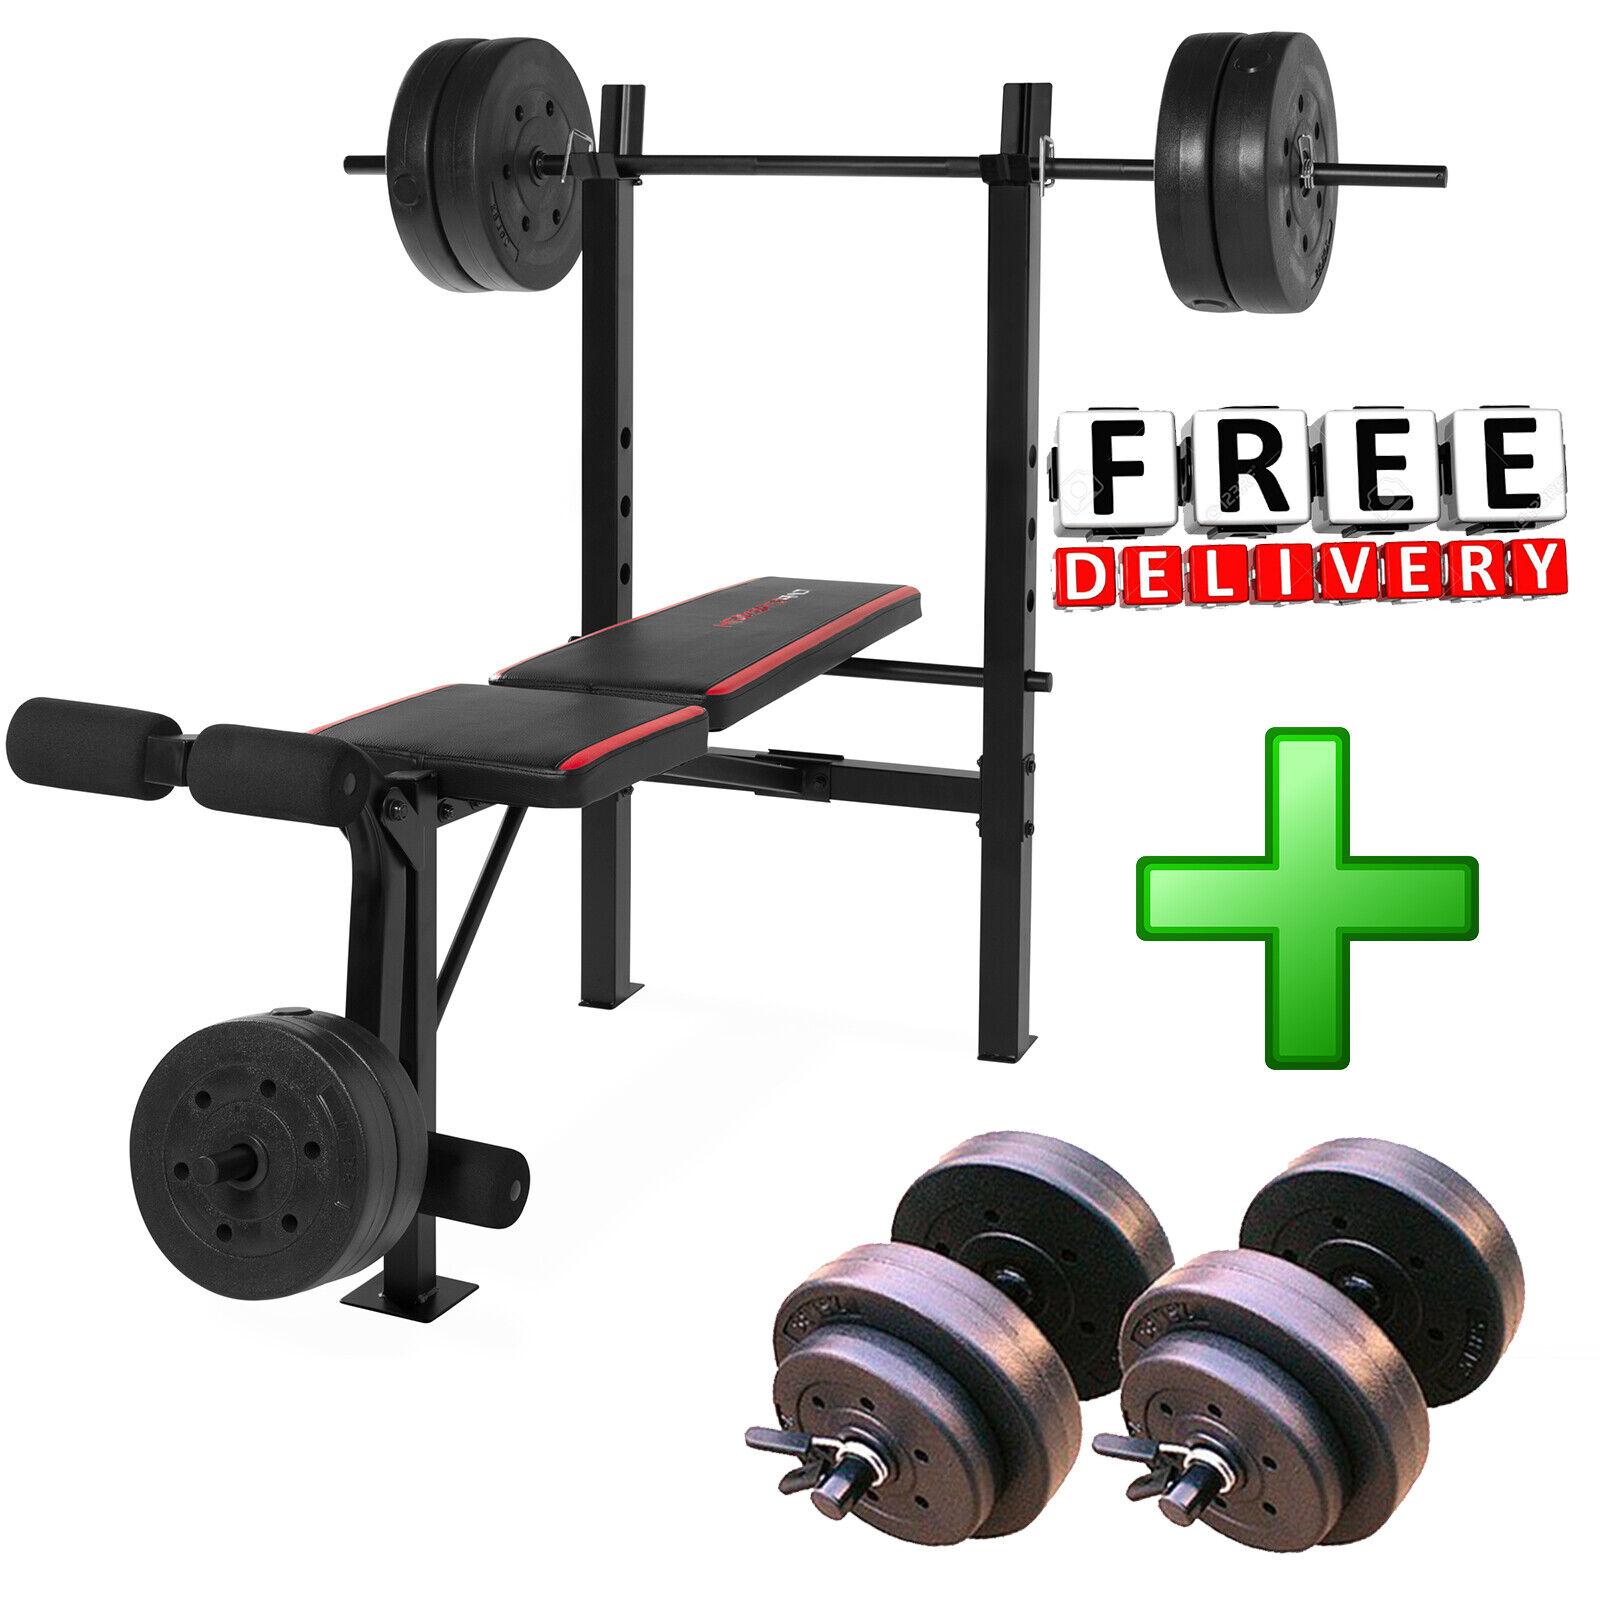 Fitness-Benchmark mit Gewicht Set 140lb Gym Barbell EquipSiet Home Training